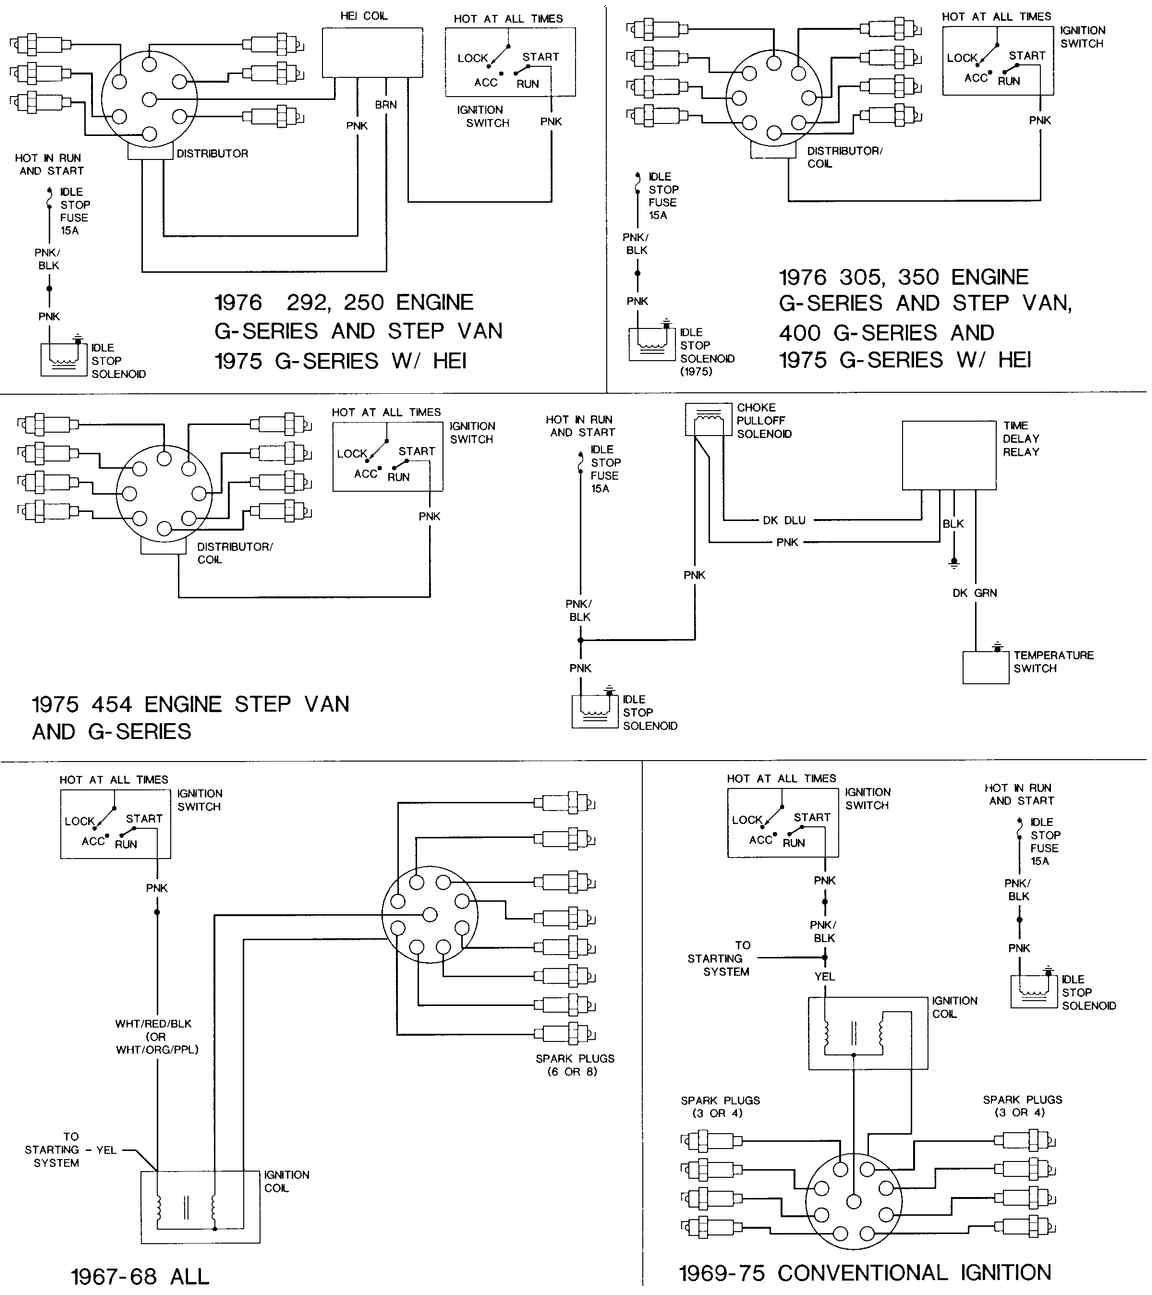 cargo light wiring diagram telecaster 4 way chevrolet silverado get free